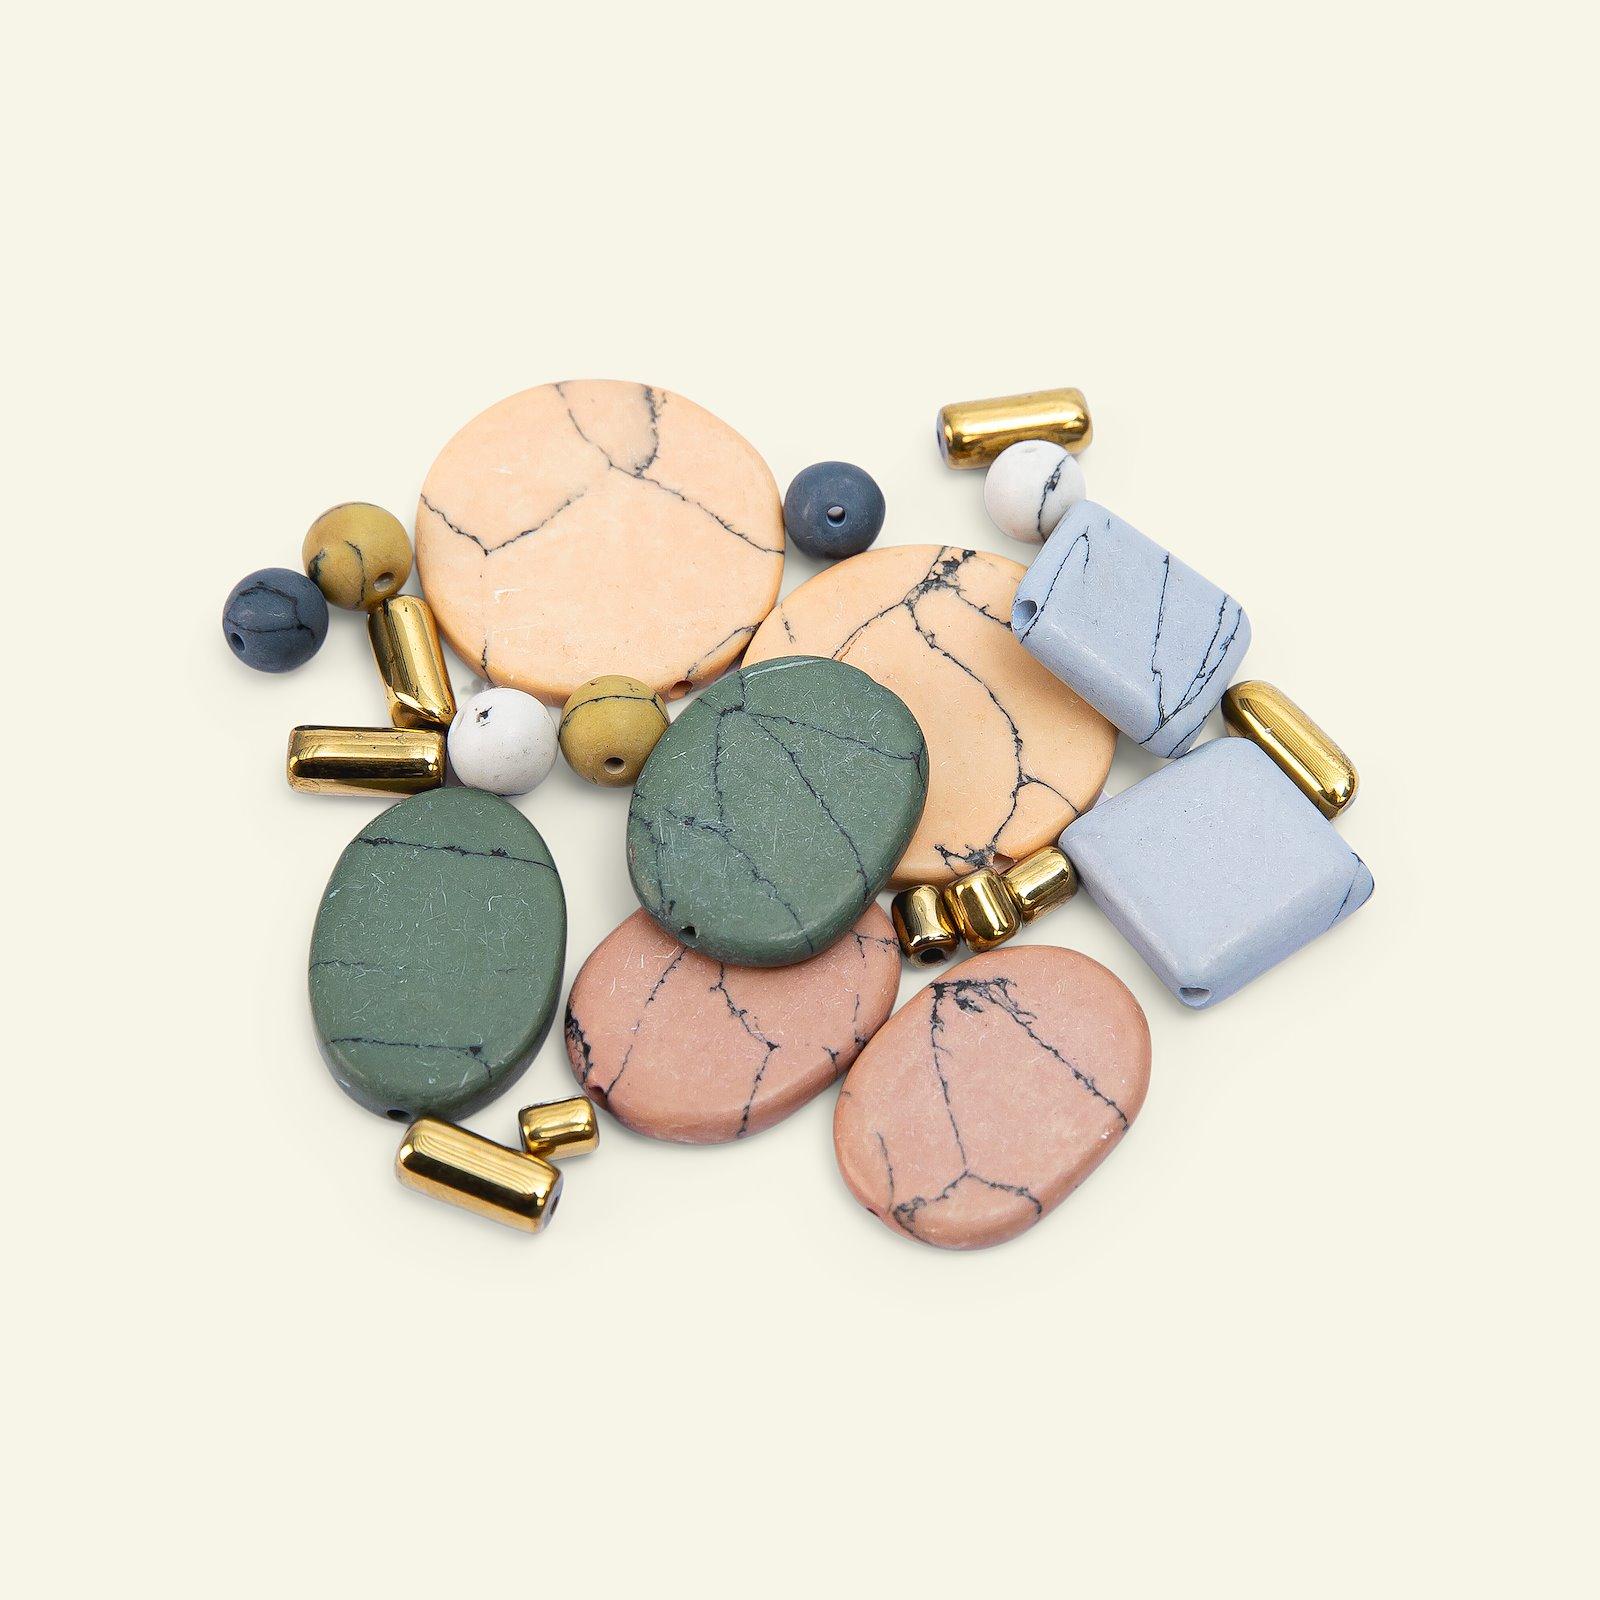 Perlen-Mix Keramik/Metall 5-20mm, 24 St. 47601_pack